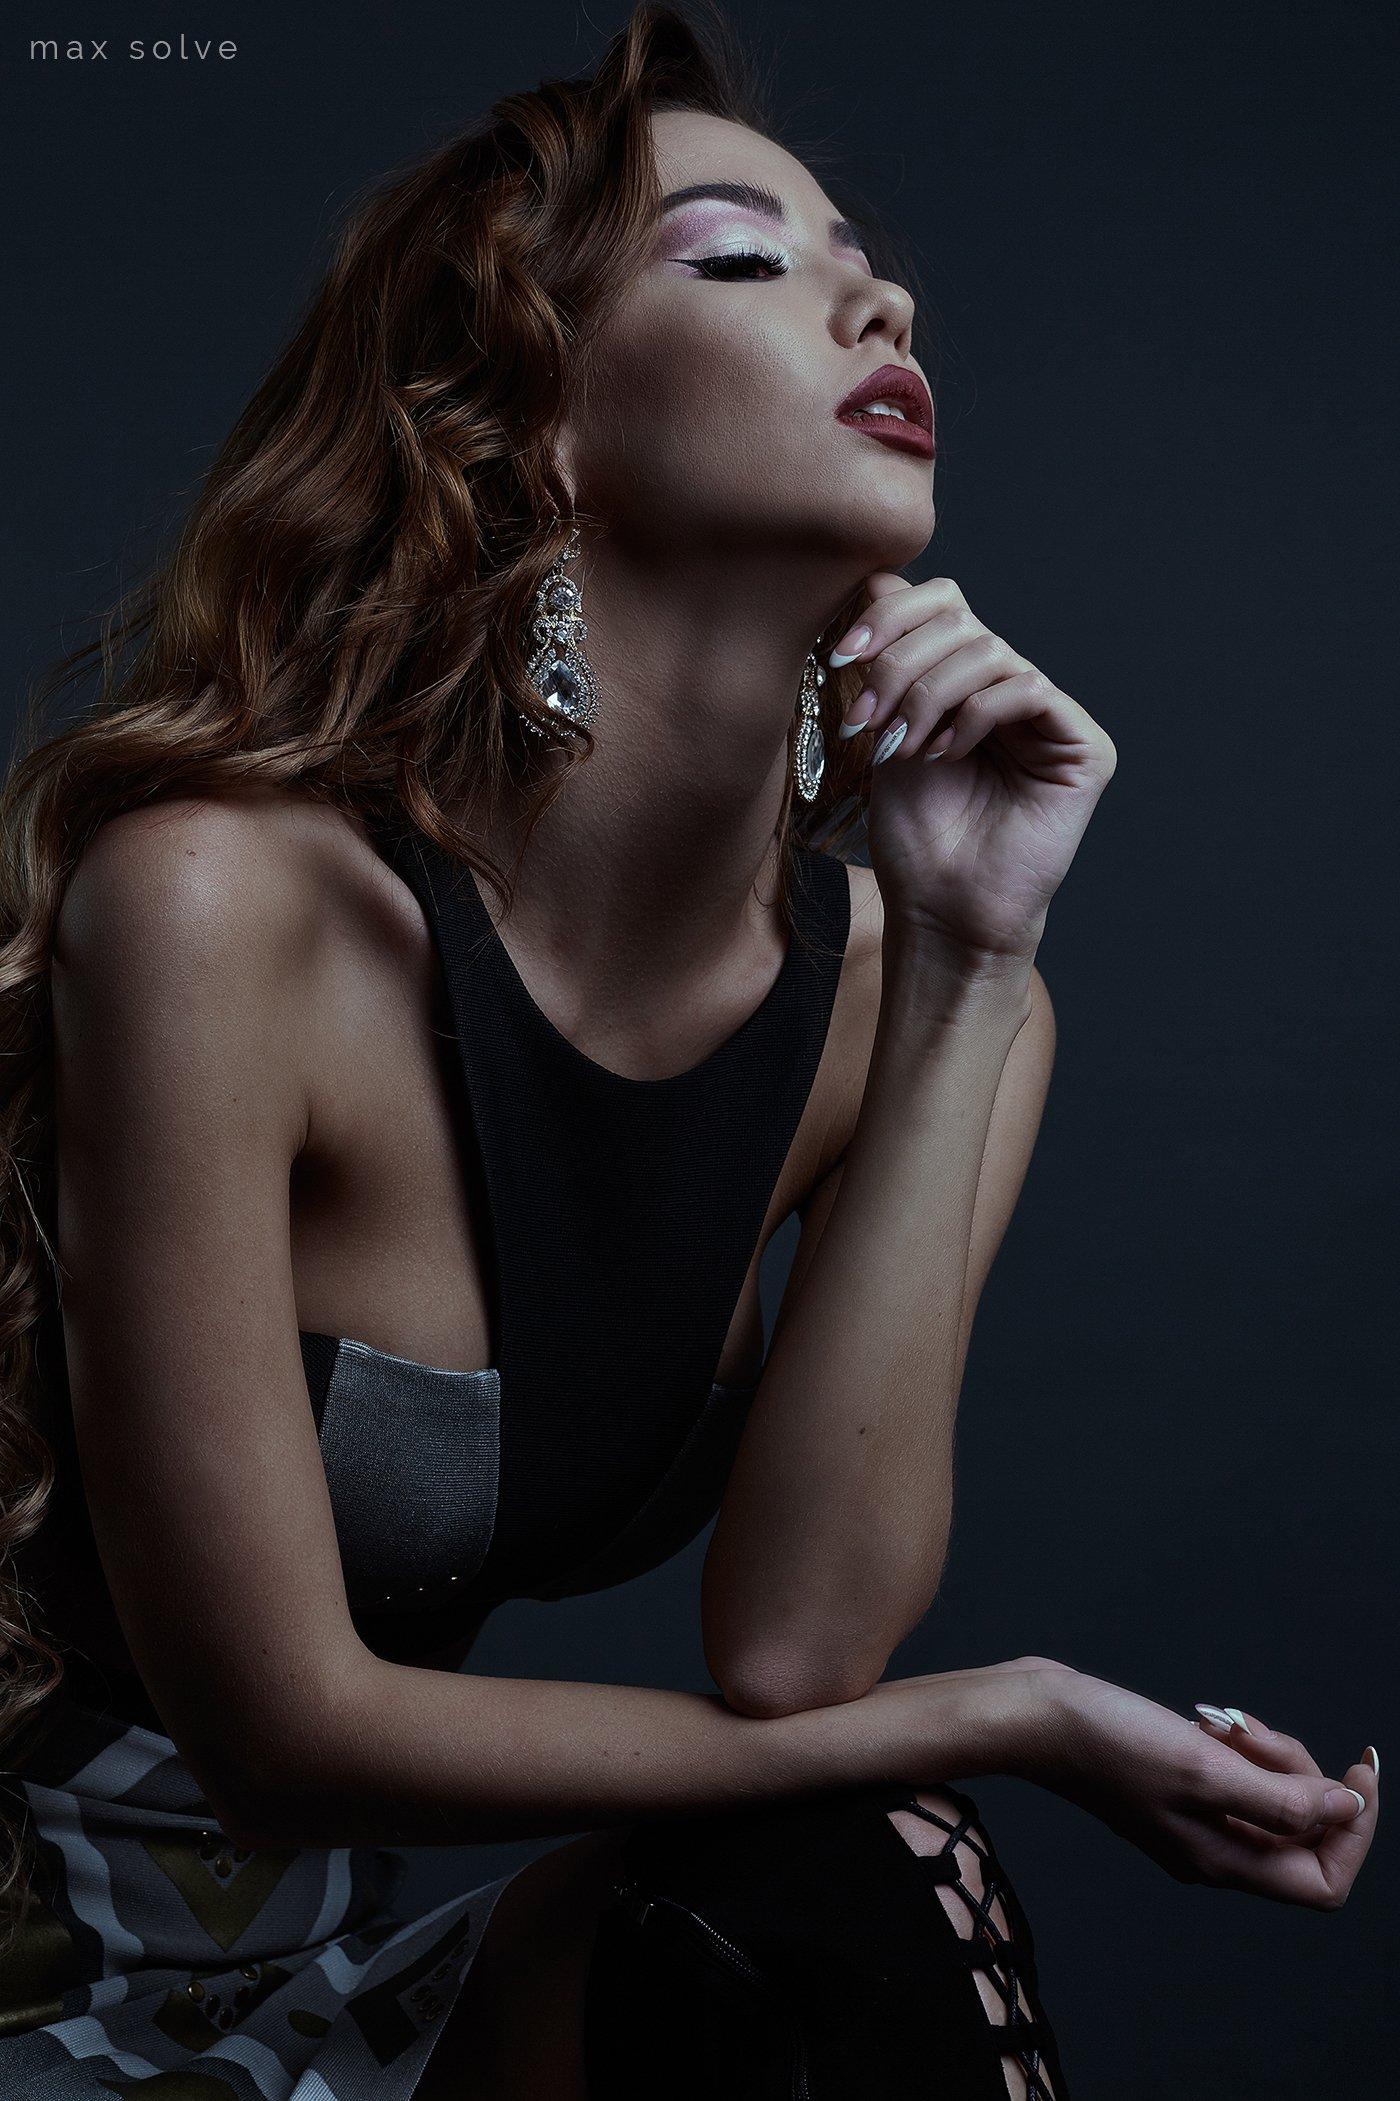 sexy, hot, fineart, studio, portrait, models, beauty, girls, girl, hair, девушка, студия, портрет, , Max Solve